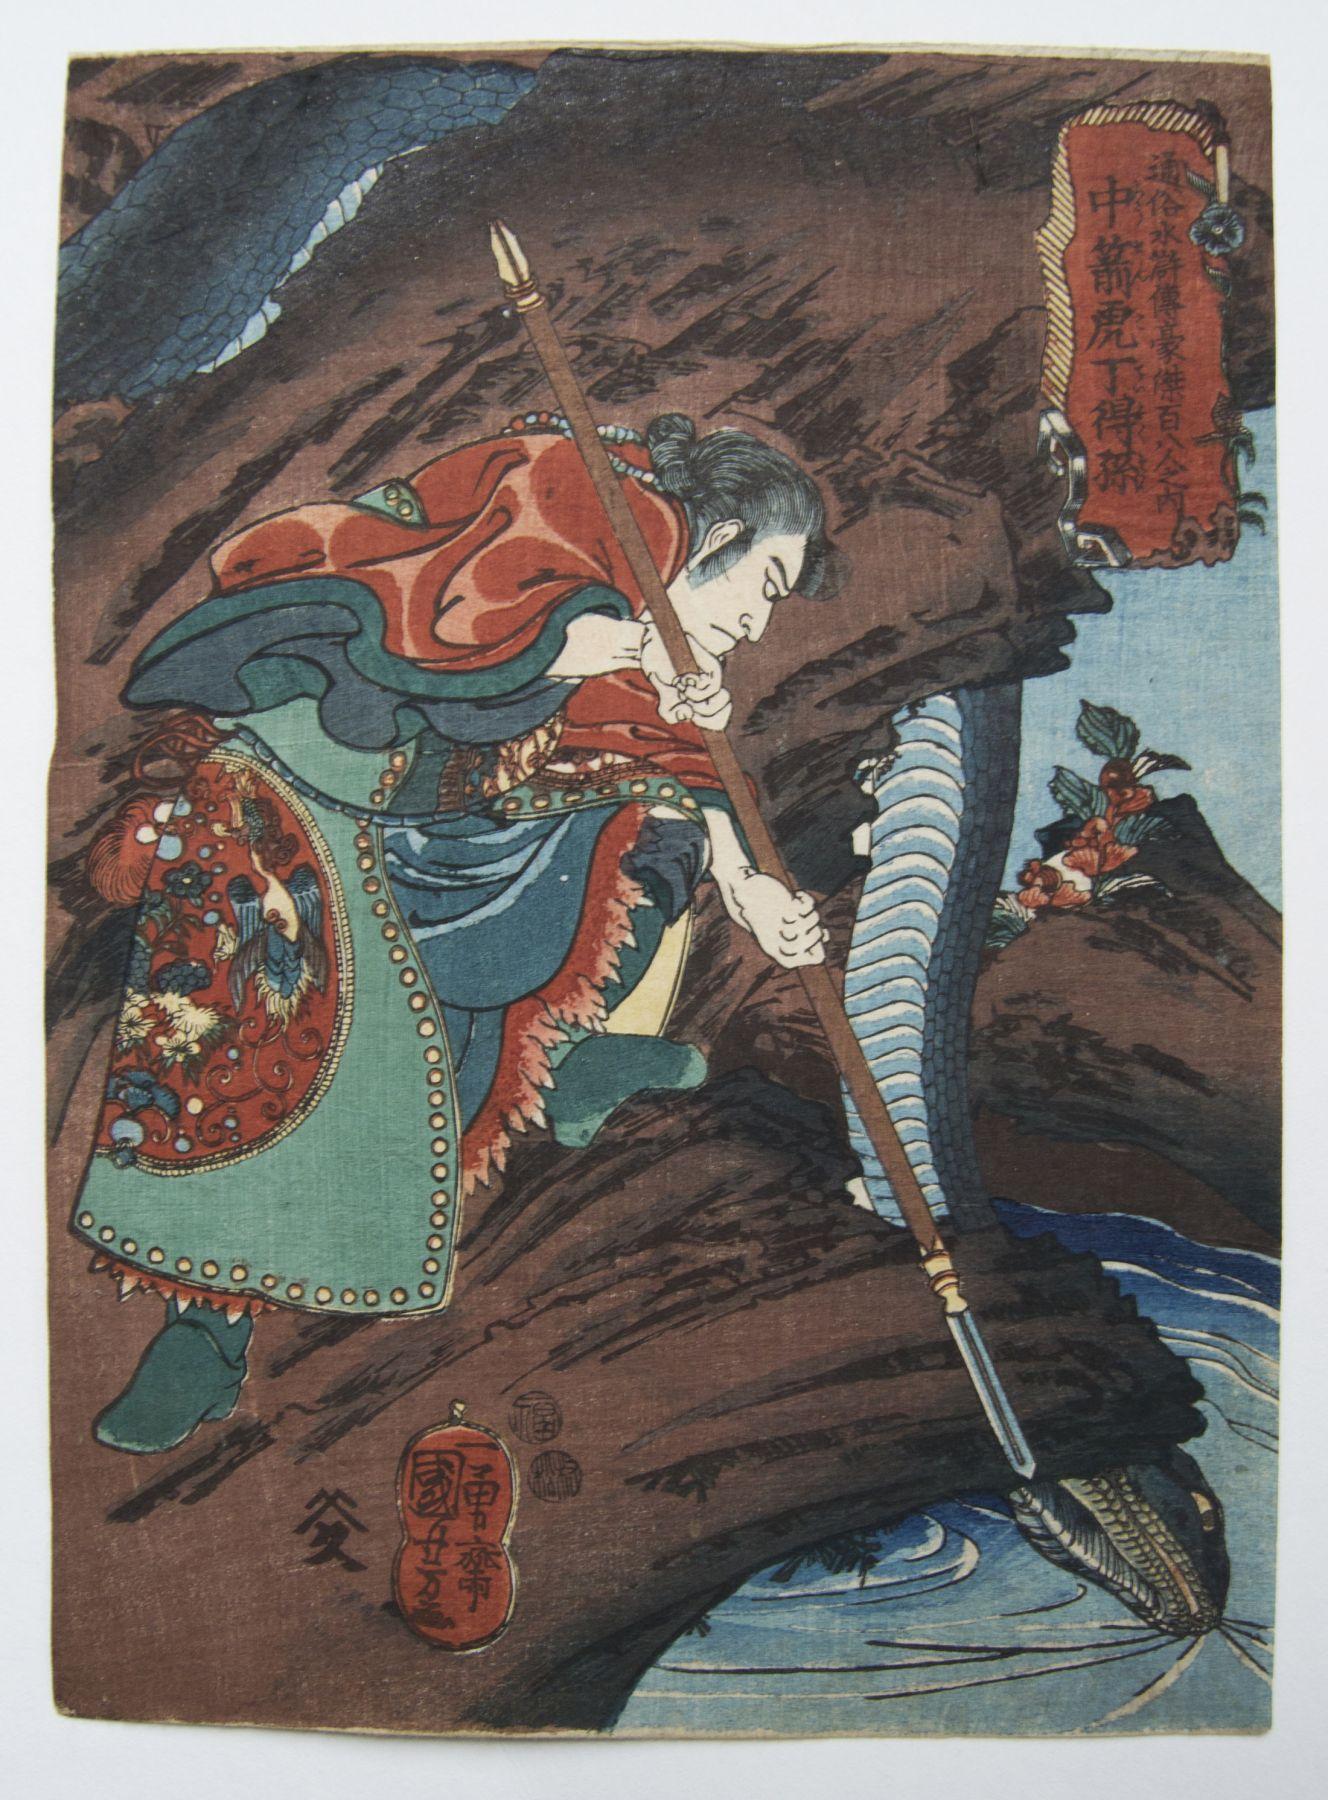 Utagawa Kuniyoshi (1797-1861), Chusenko Teitokusen killing a giant snake